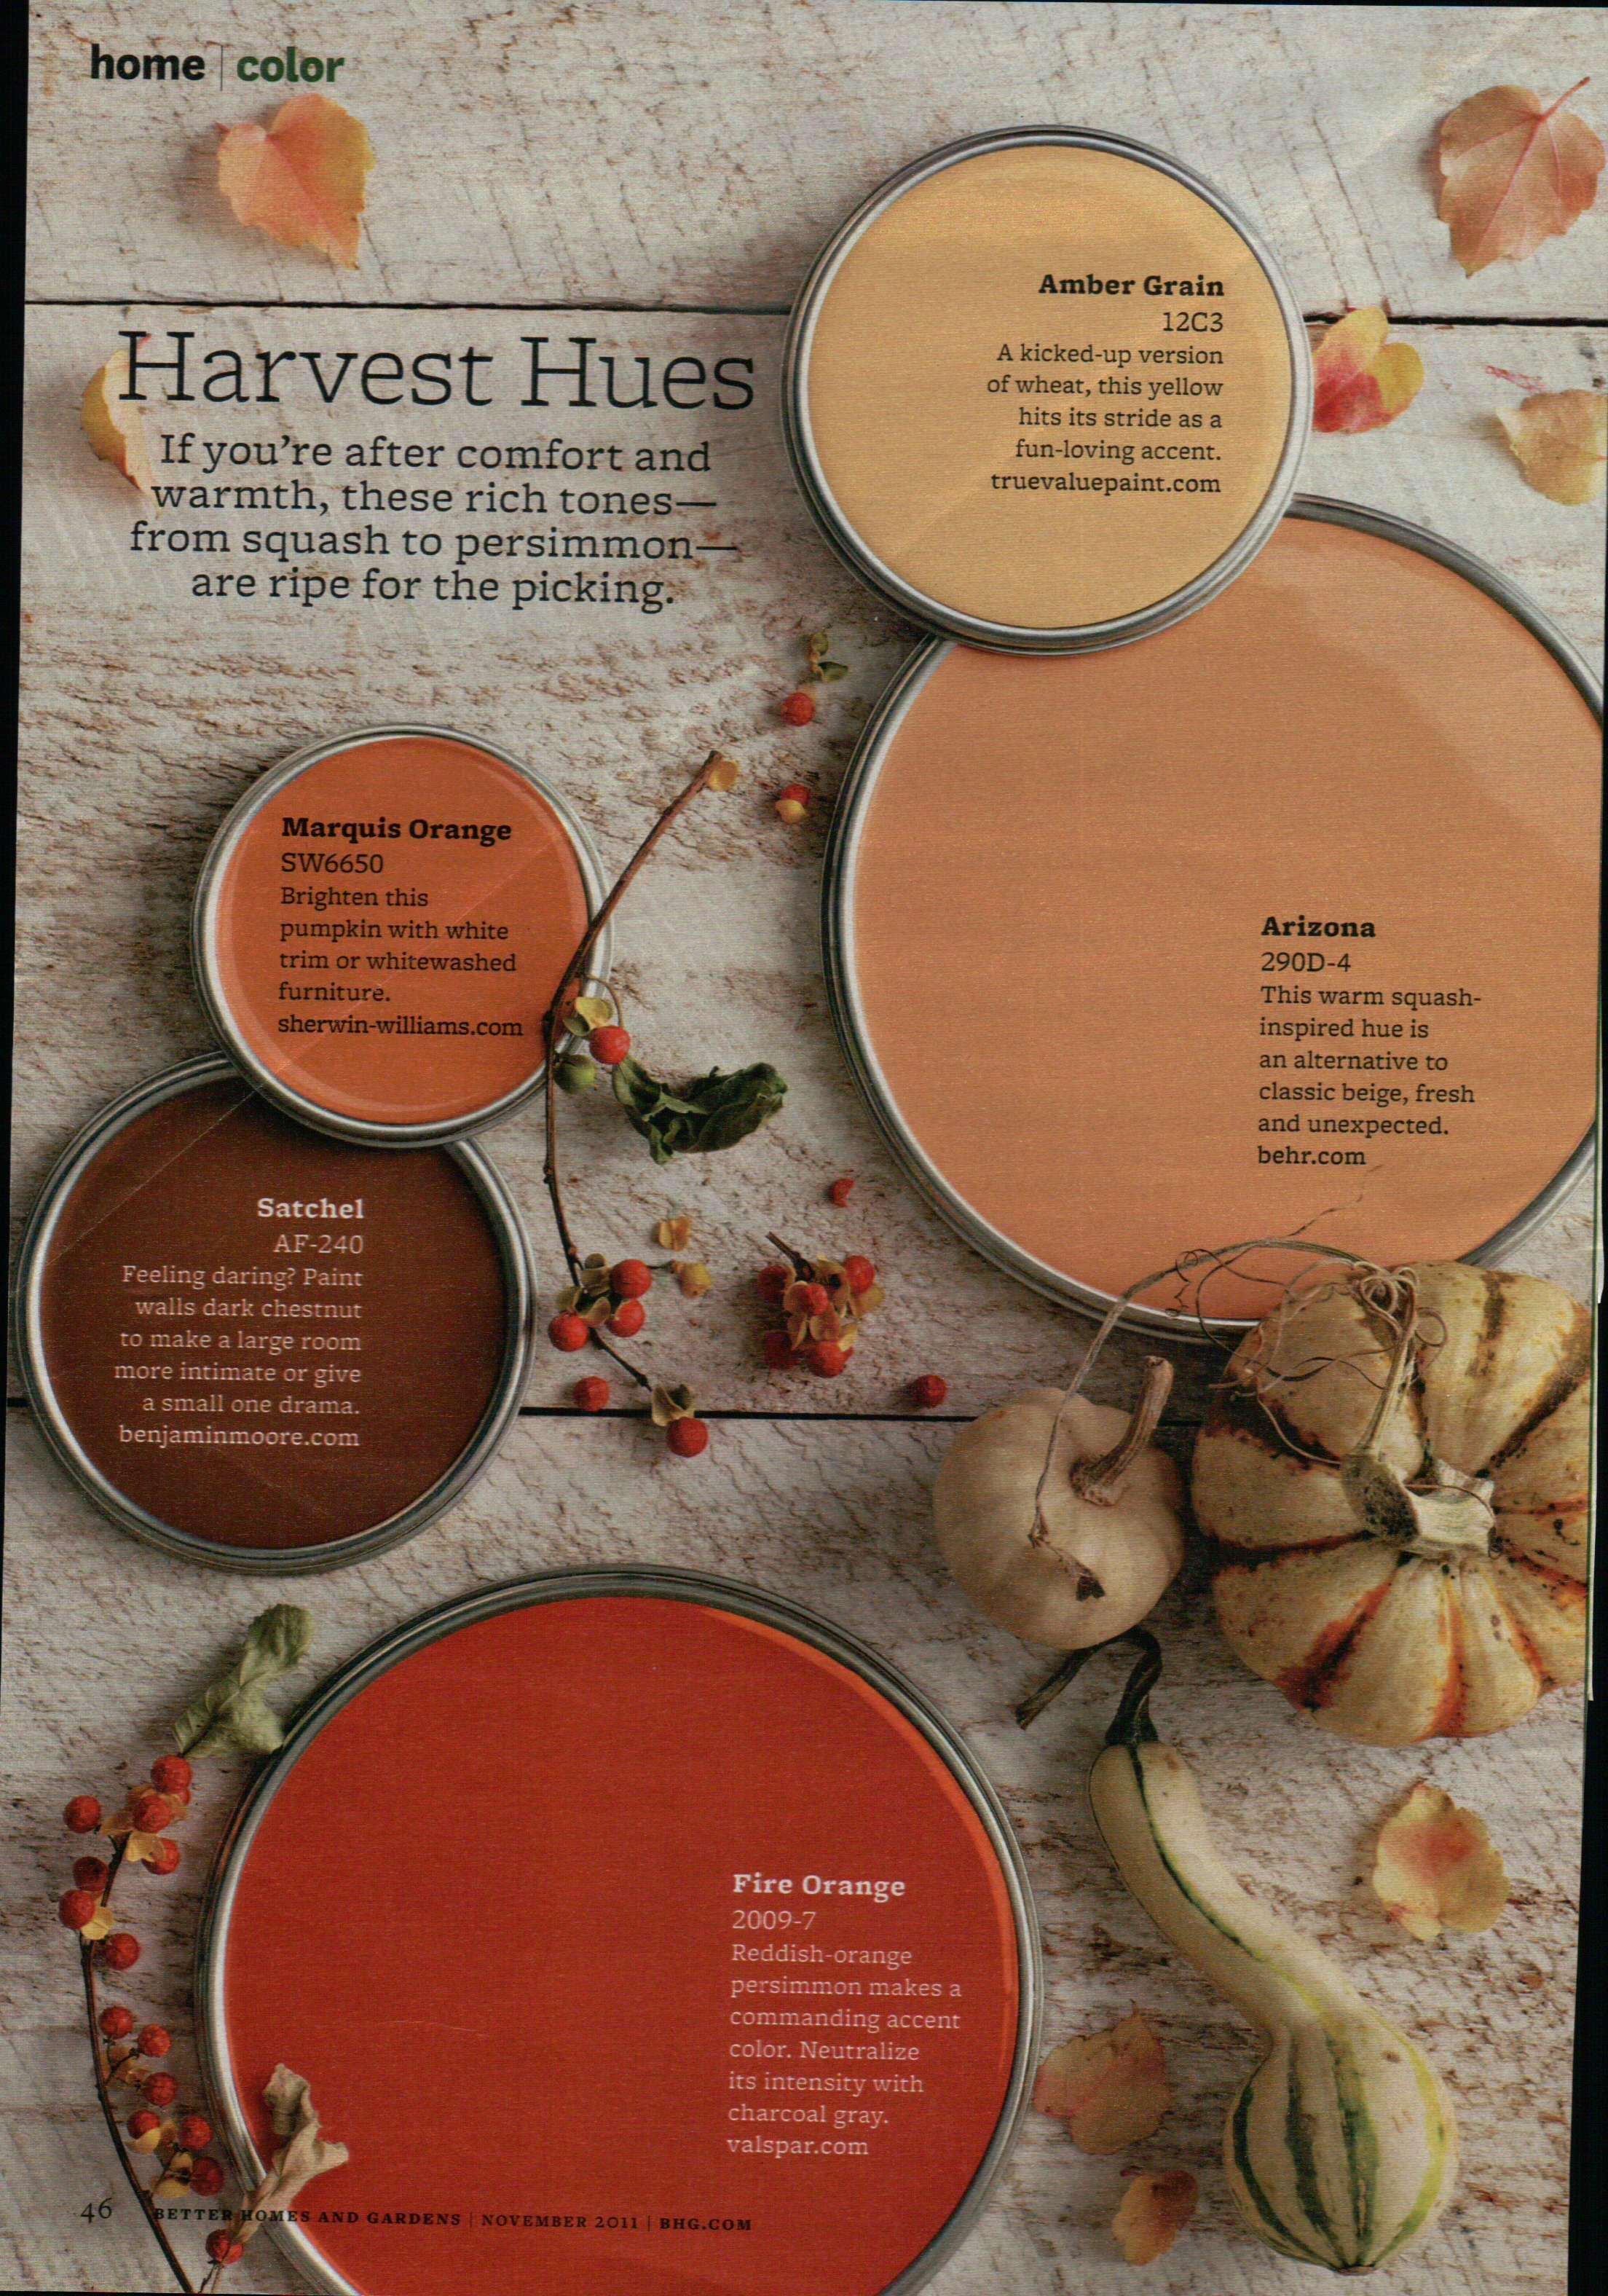 harvest hues paint painting tips color ideas. Black Bedroom Furniture Sets. Home Design Ideas